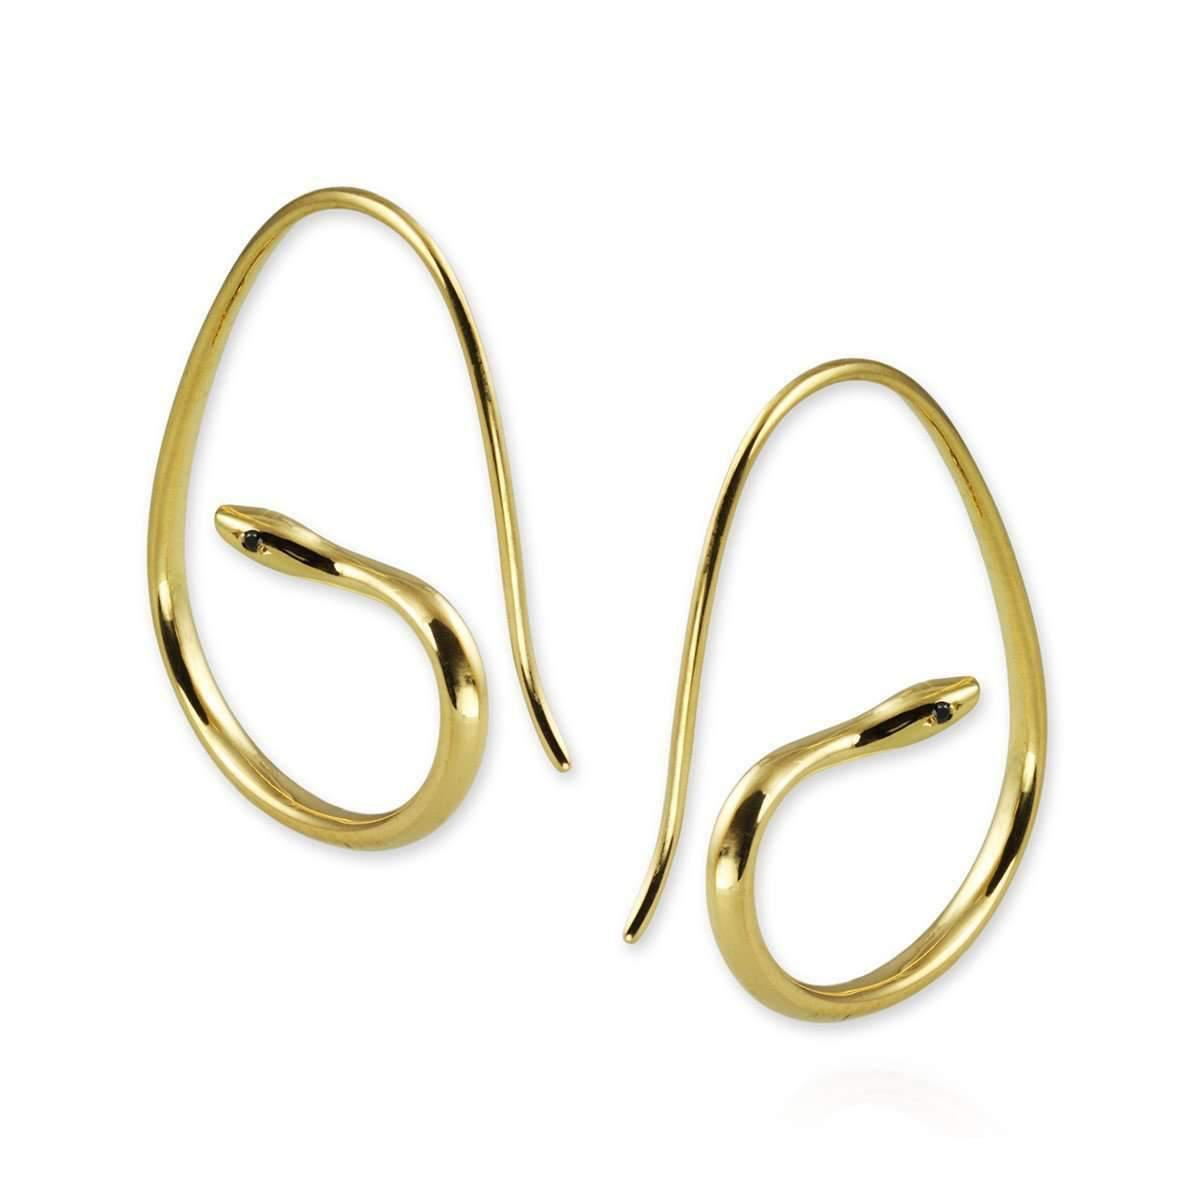 Jana Reinhardt Gold Plated Silver Snake Hoop Earrings With Black Diamonds cjMmdta